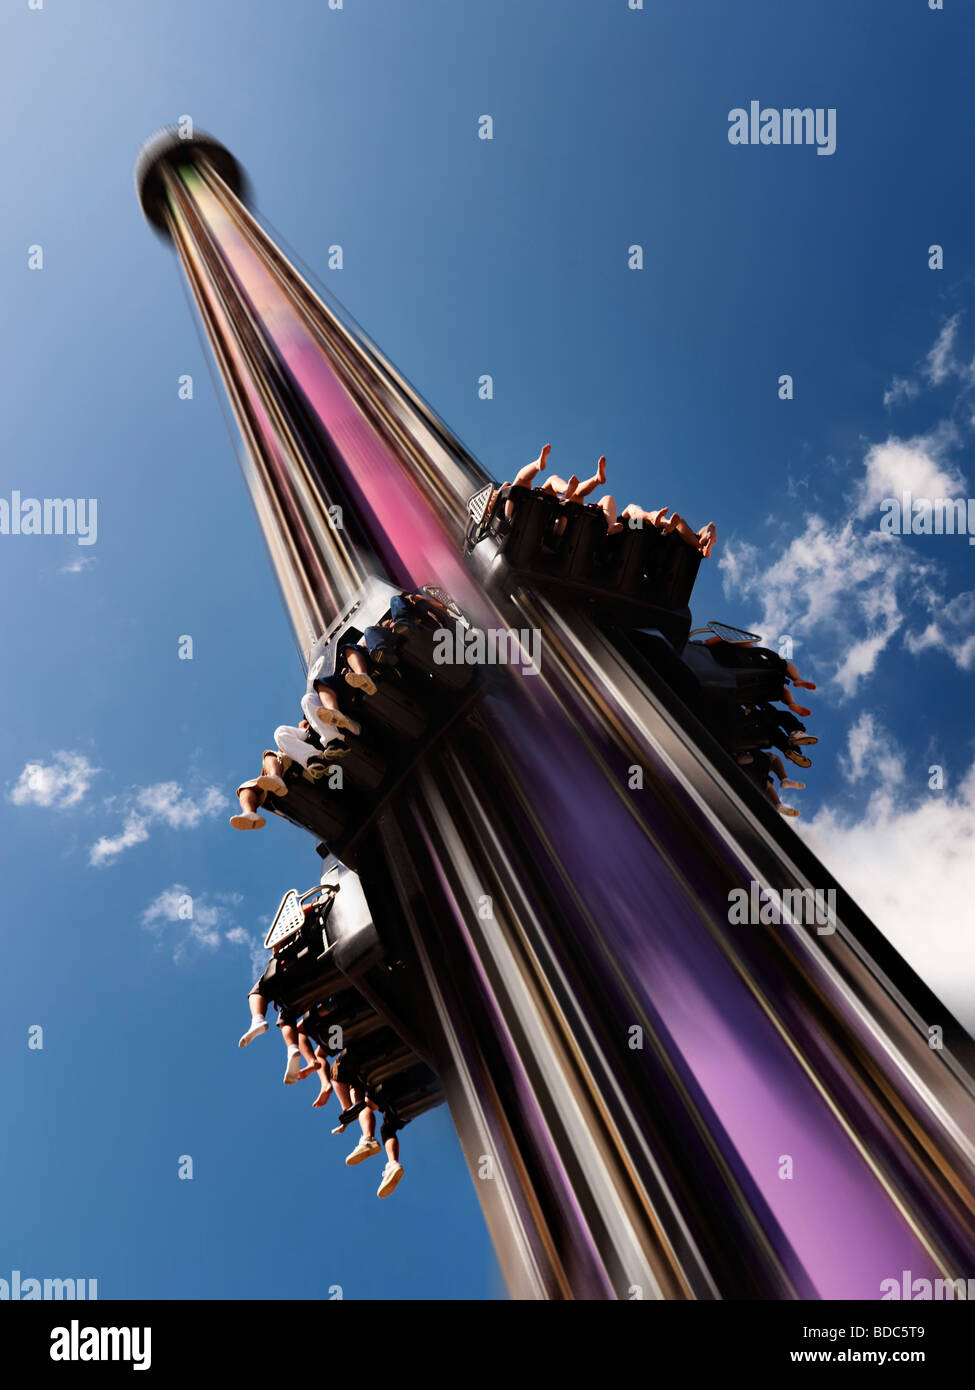 Drop Tower free fall thrill ride at Canada's Wonderland amusement park - Stock Image